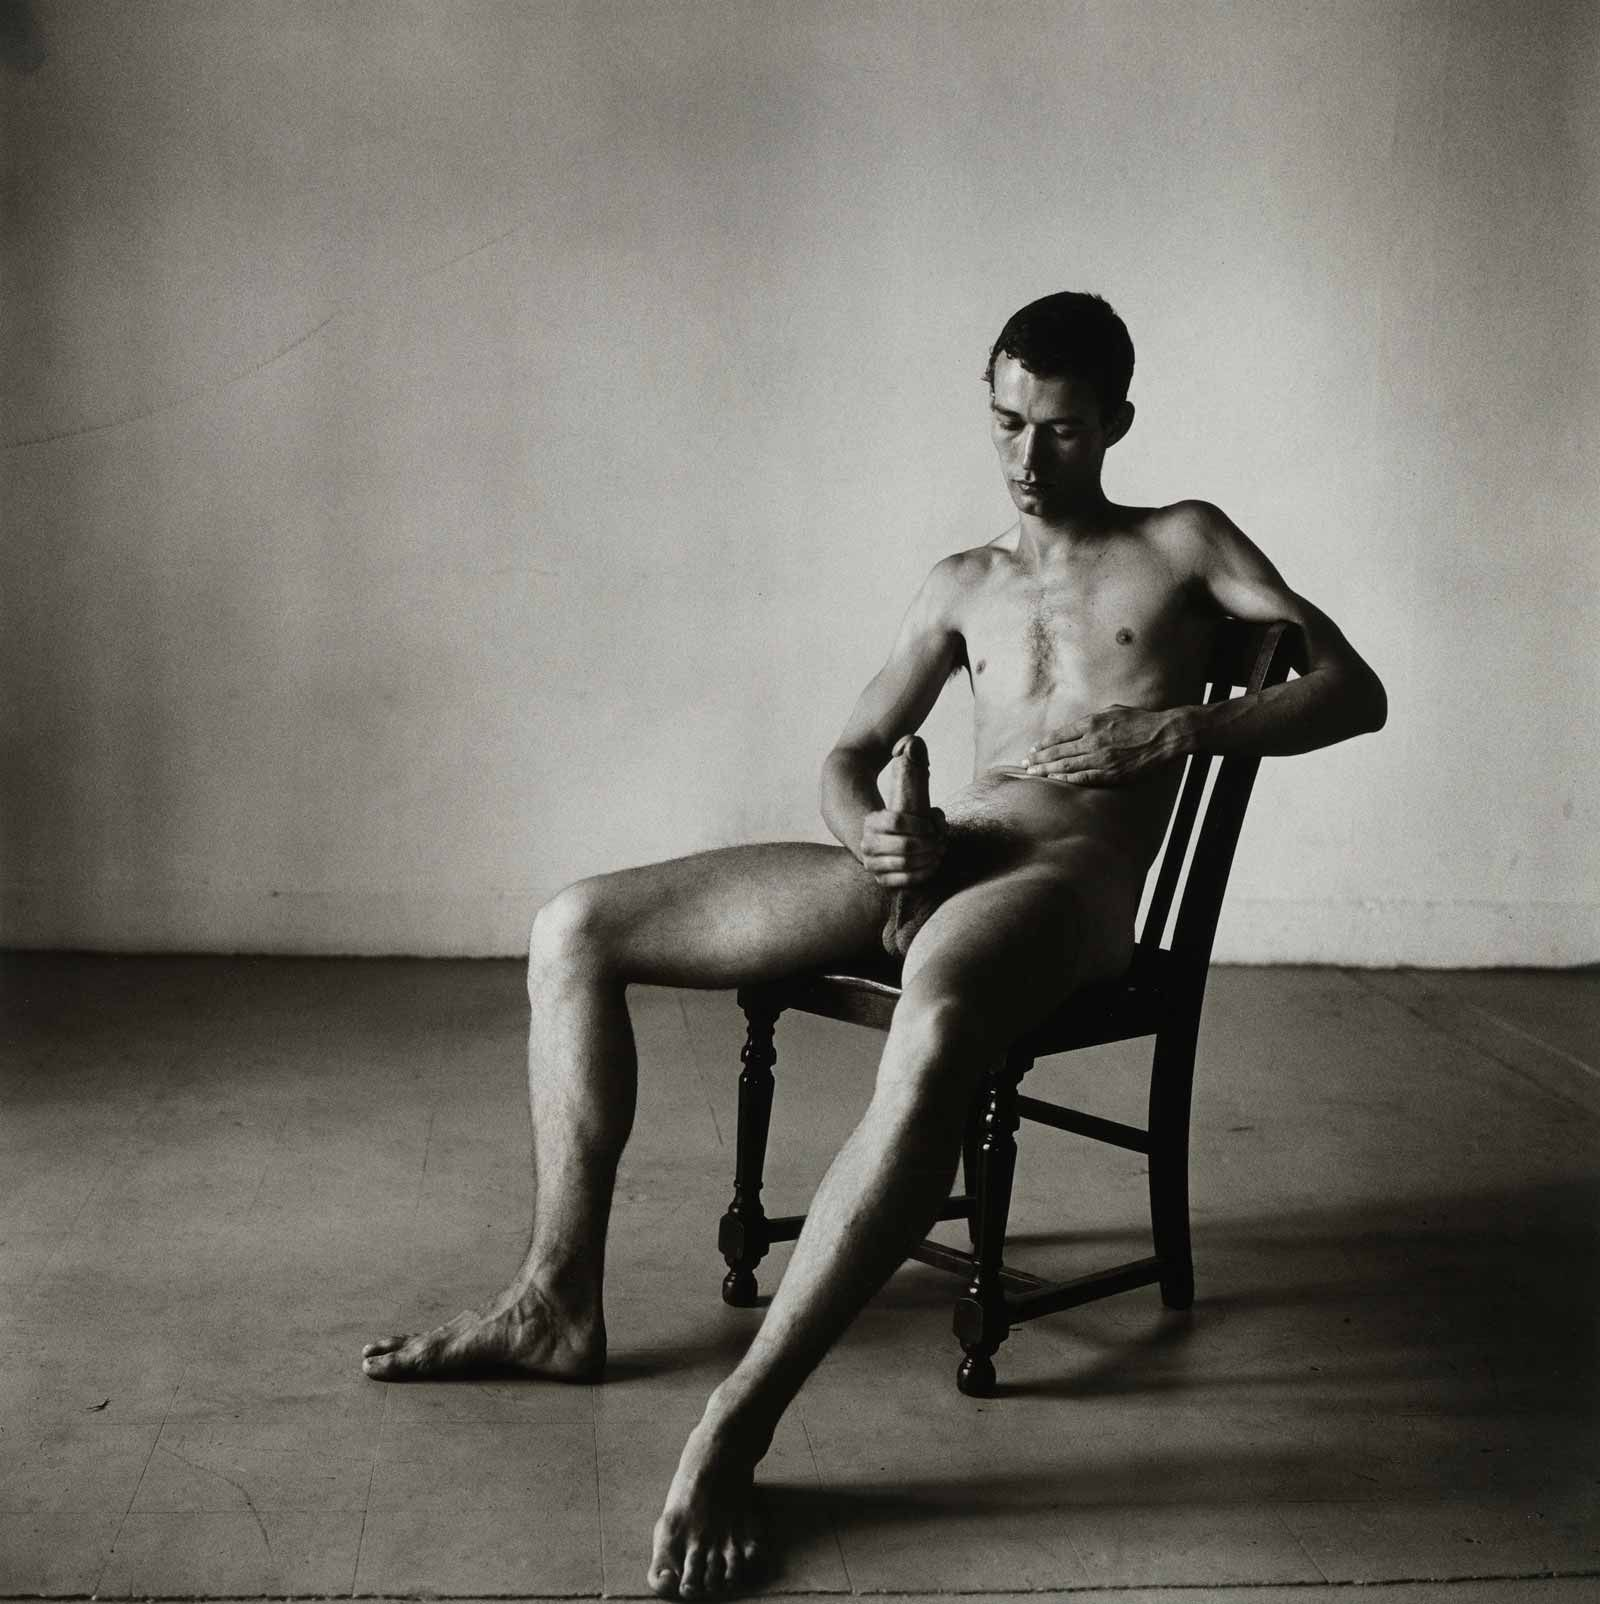 Angela Merkel Nude peter hujar's downtown   portrait, body photography, black